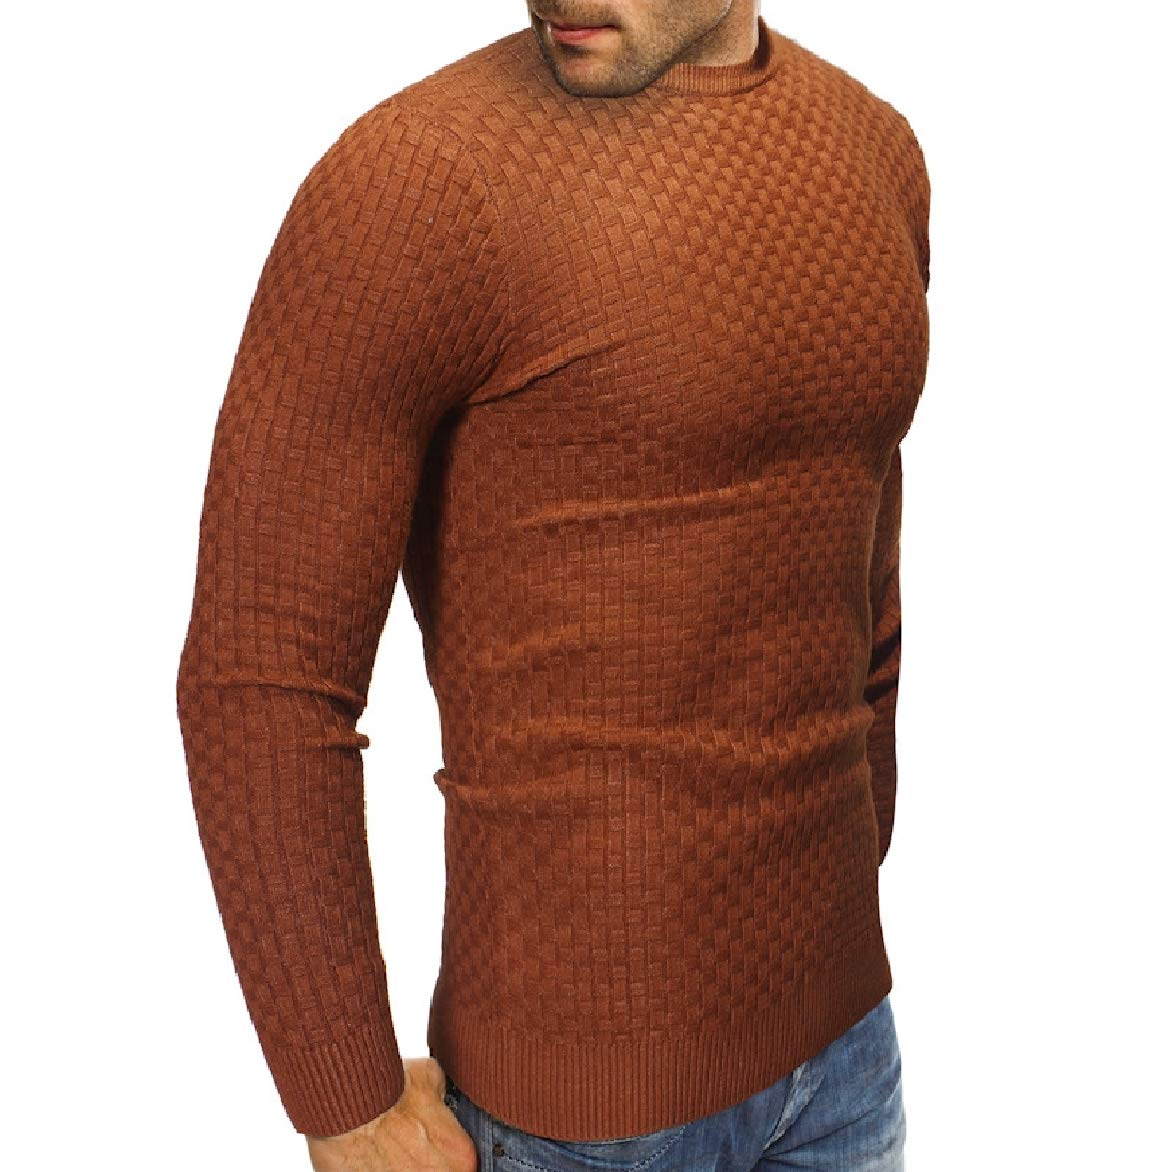 Abetteric Mens Autumn Winter Pure Color Crew Neck Knitwear Pullover Cozy Sweaters